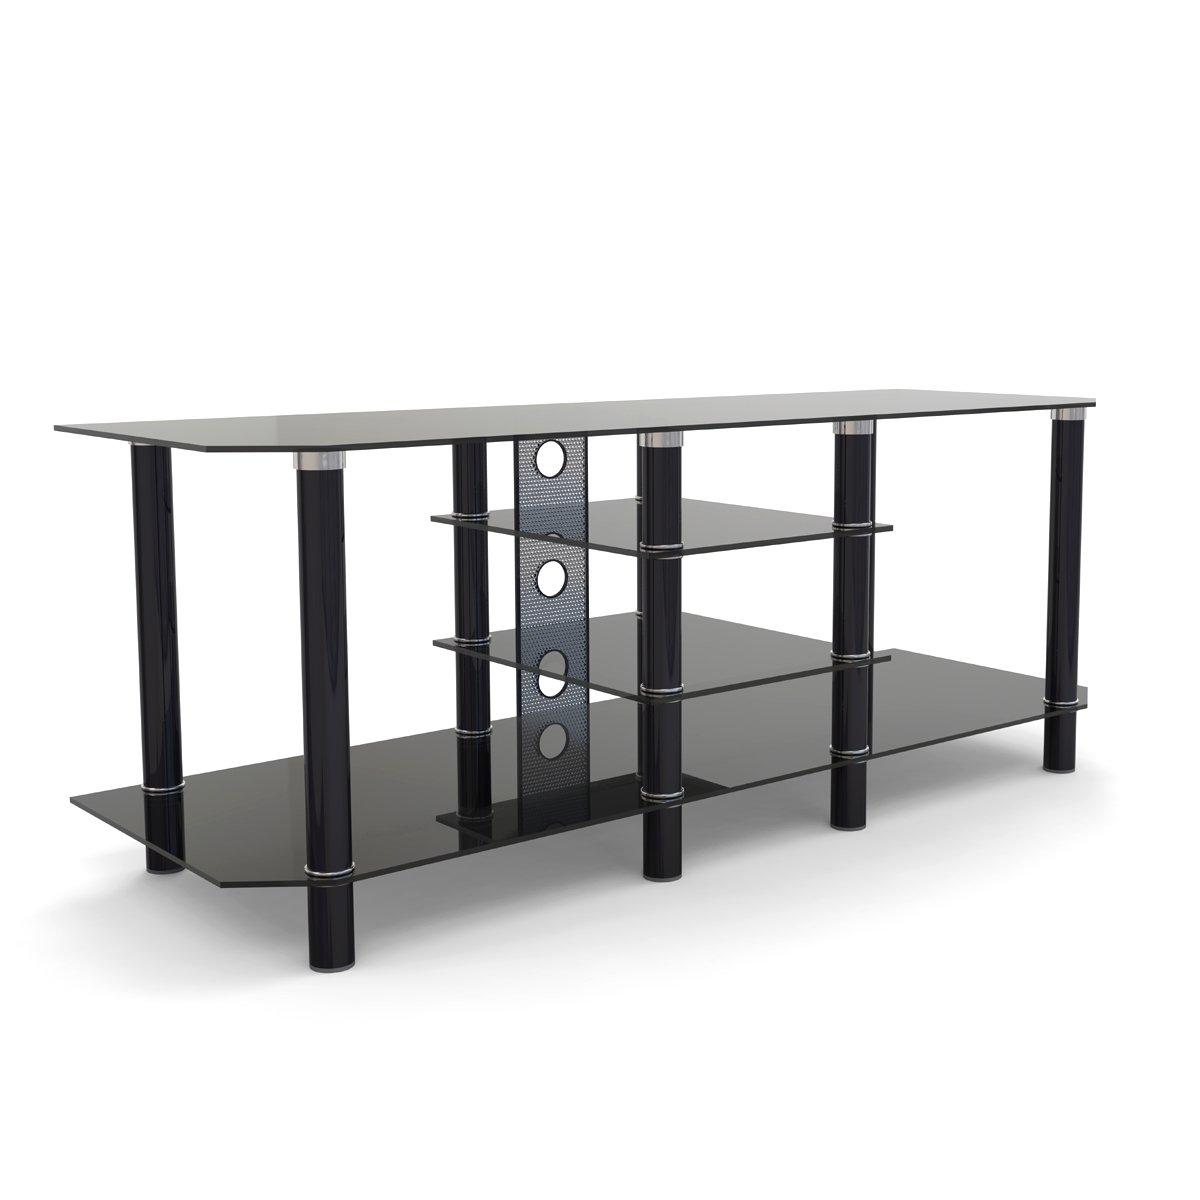 Ryan Rove Hamlin Glass Component Stand in Black